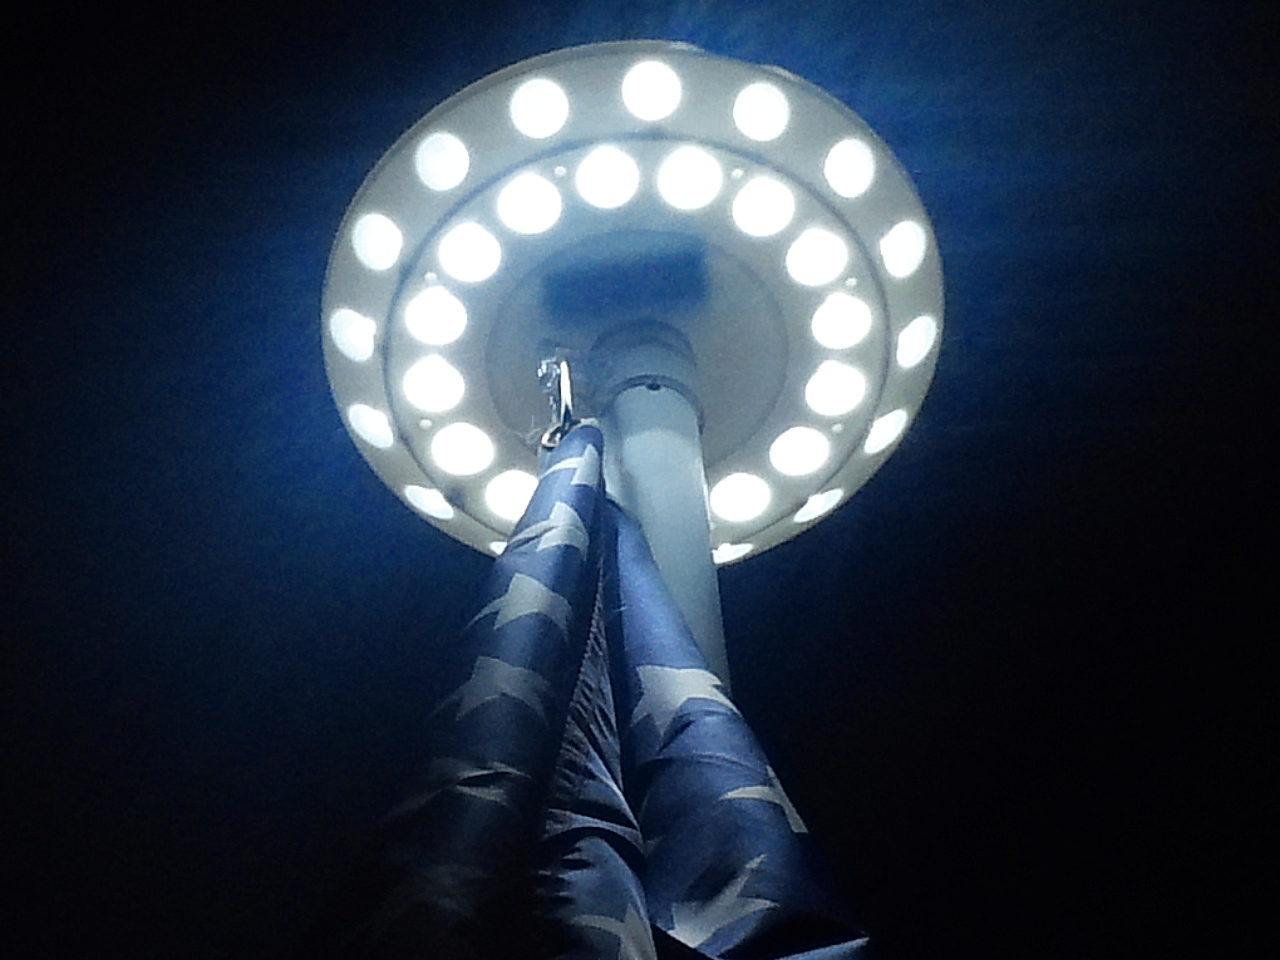 Brightest Led Flood Light Bulbs